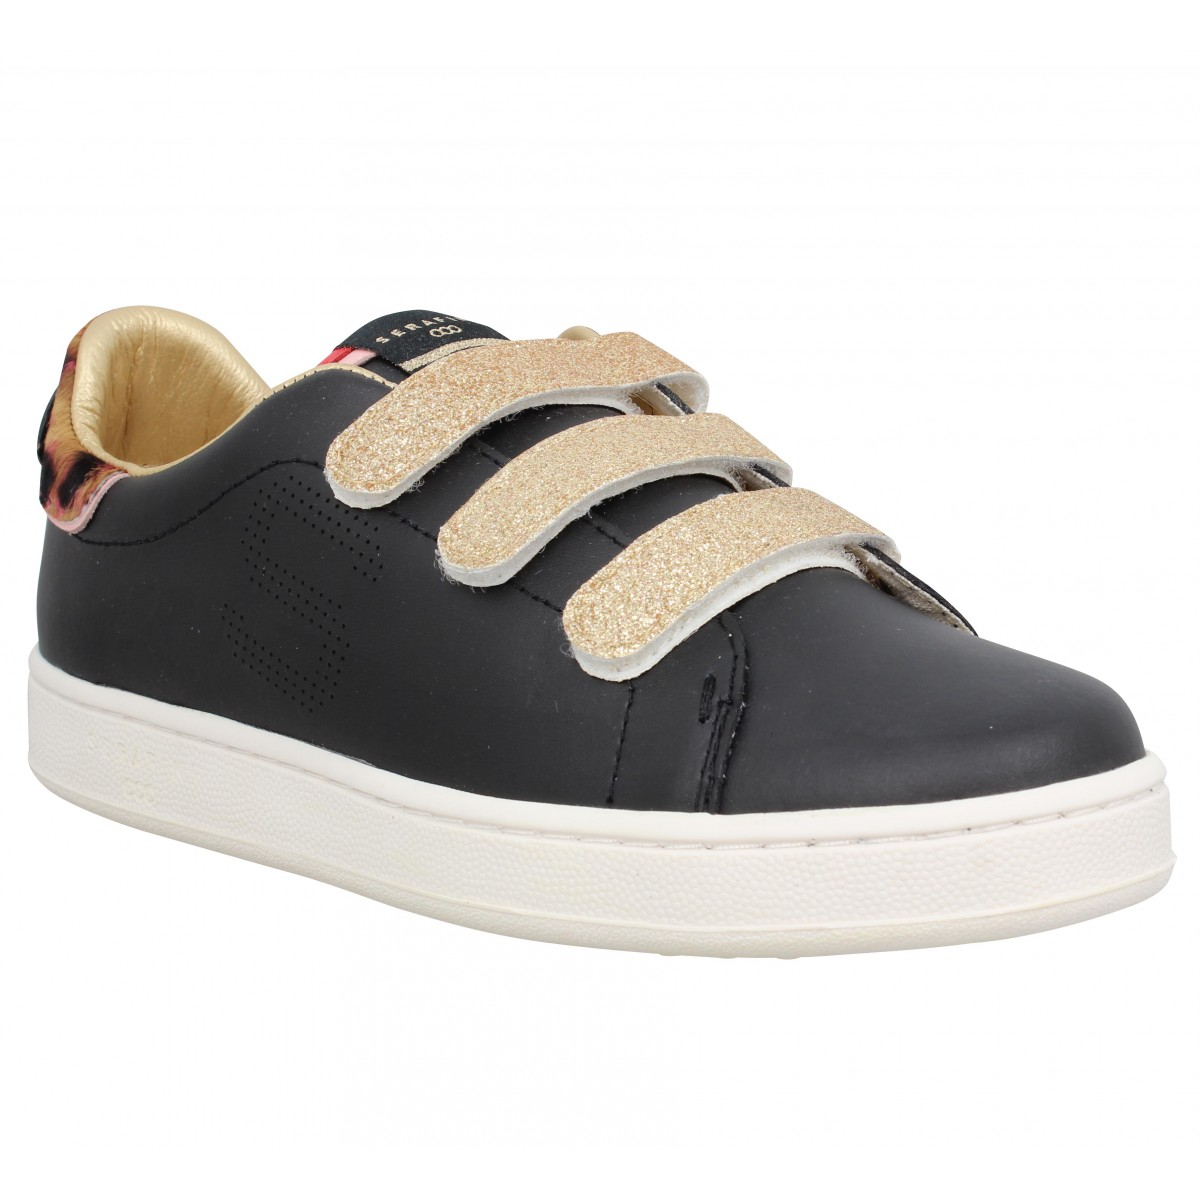 serafini chaussures femme